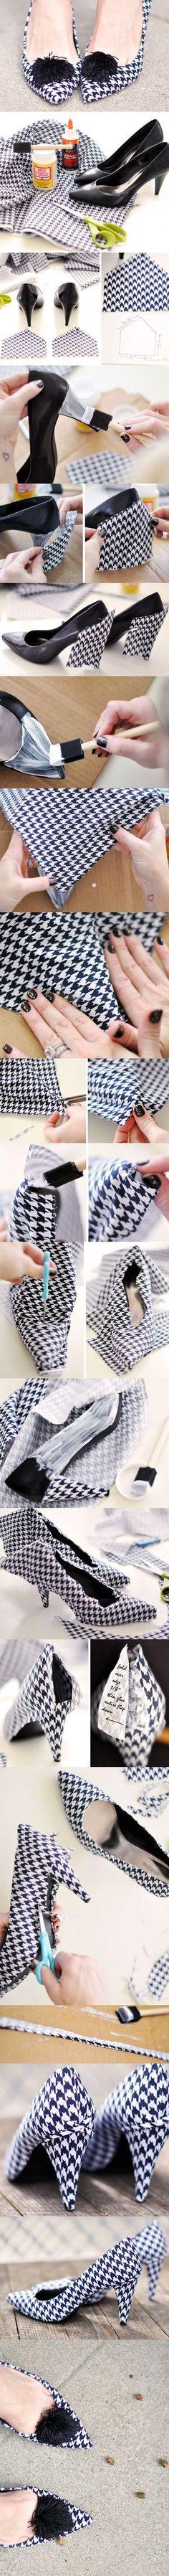 DIY: Designer Shoes Project  OMG!  I love this idea!